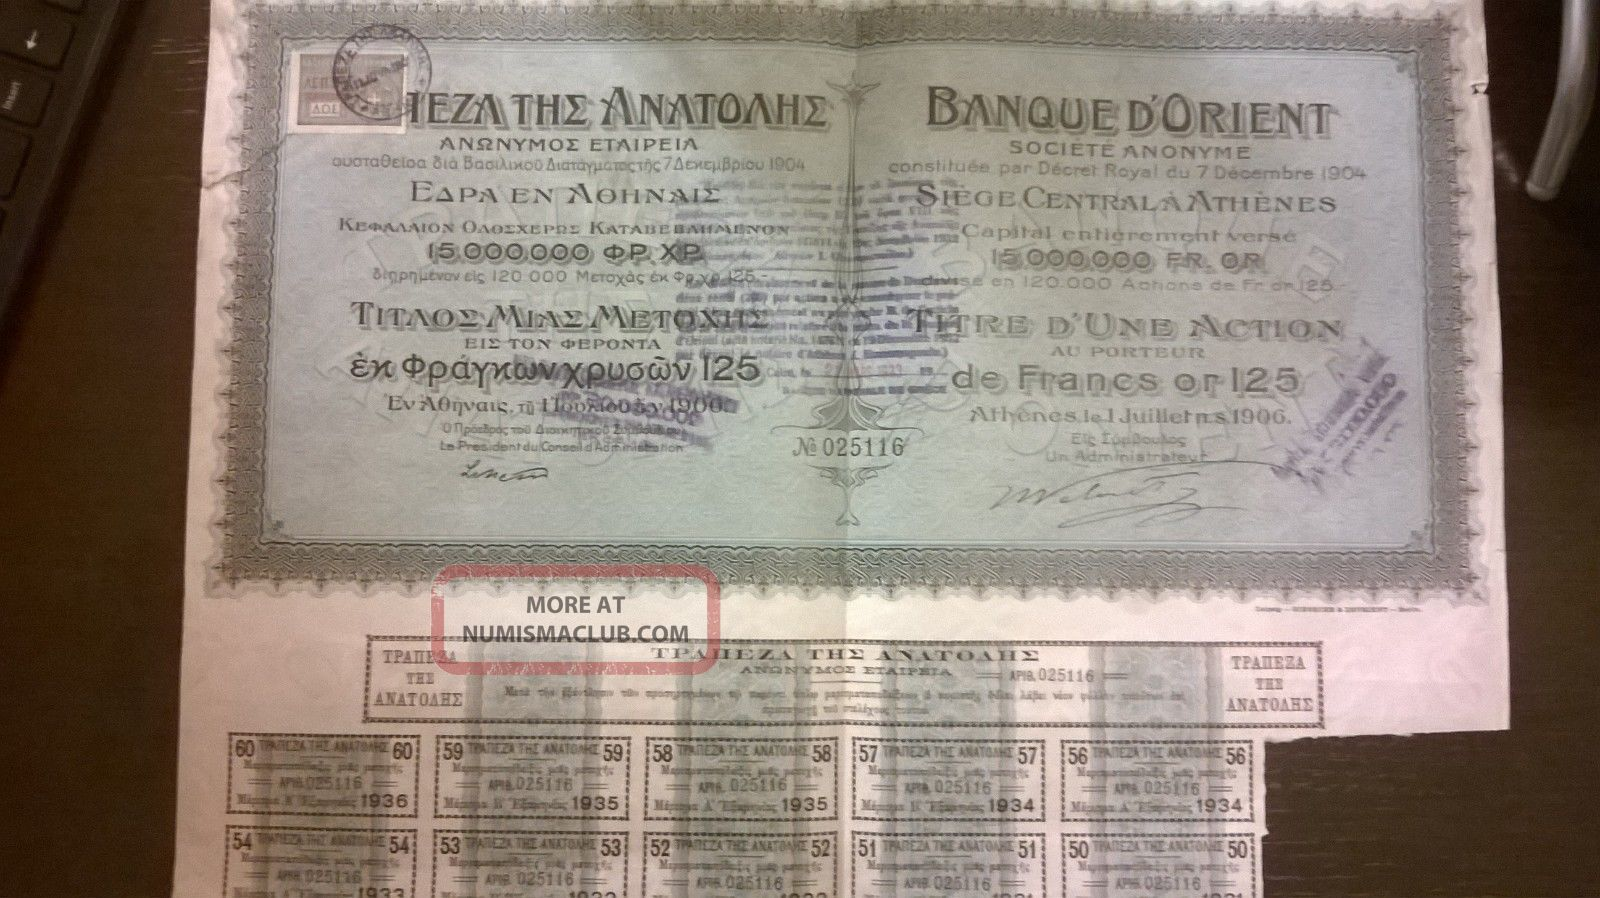 Banque D ' Orient - Athens 15,  000 Gold Francs 1906 10 Coupons Qty:1 World photo